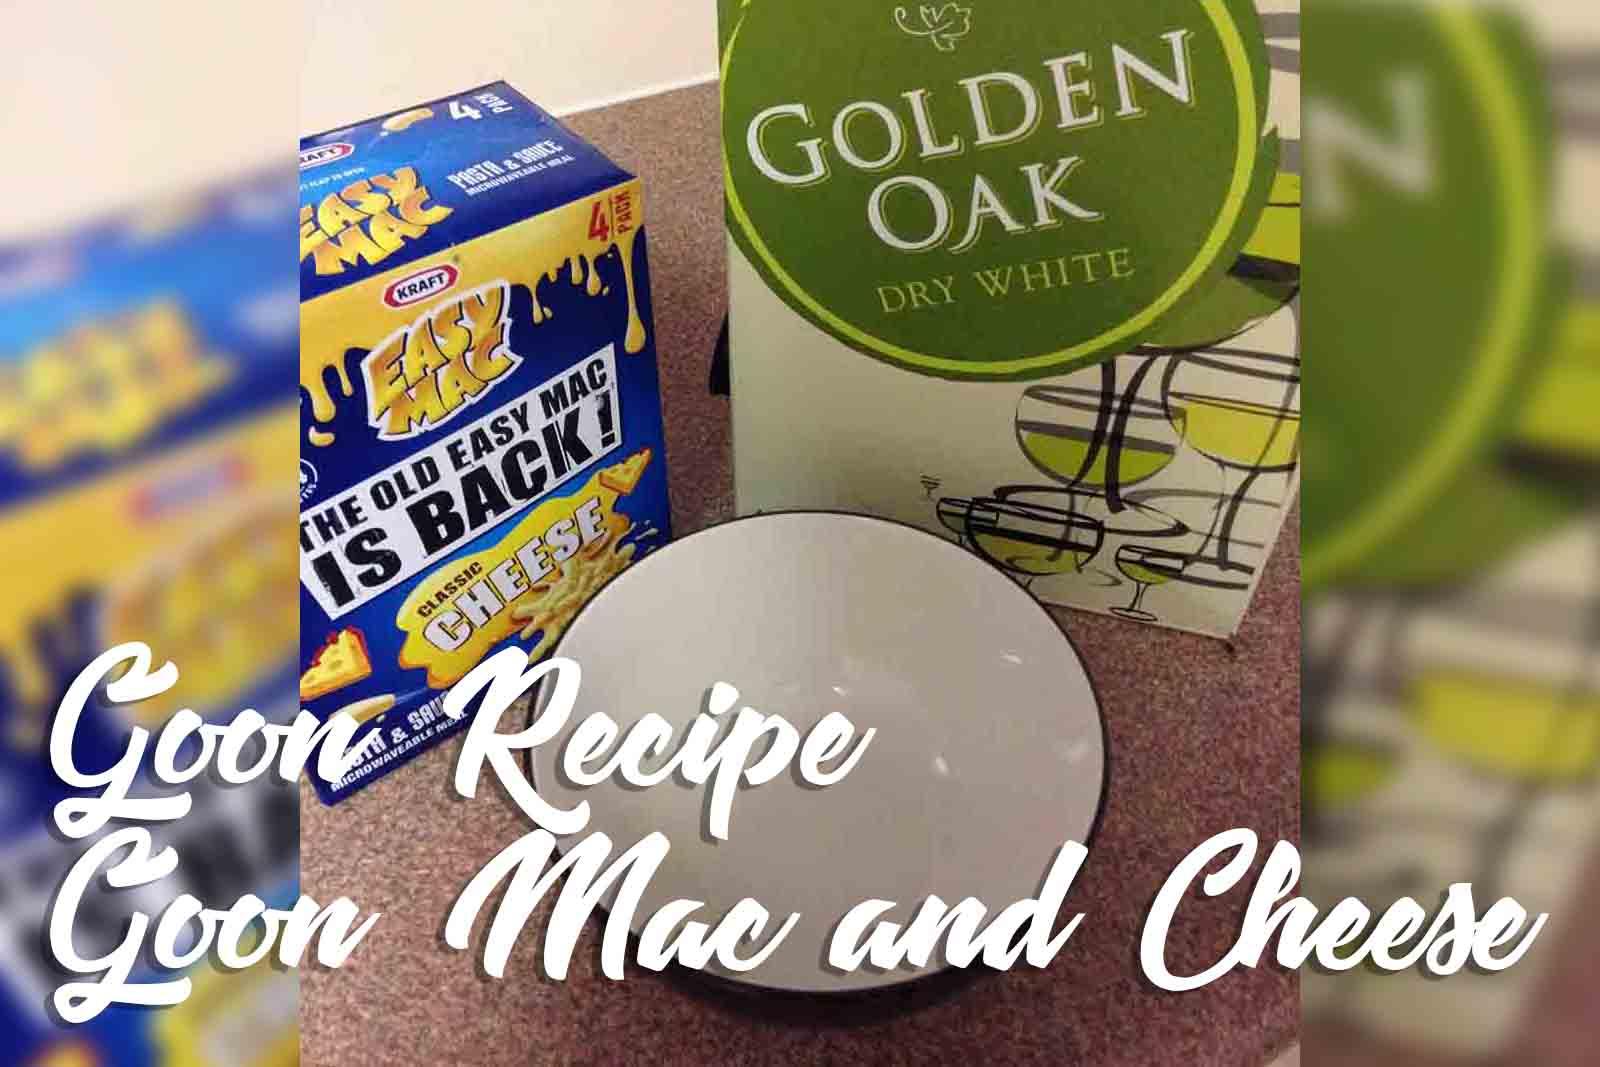 Goon_Macaroni_and_Cheese_Goon_Recipe